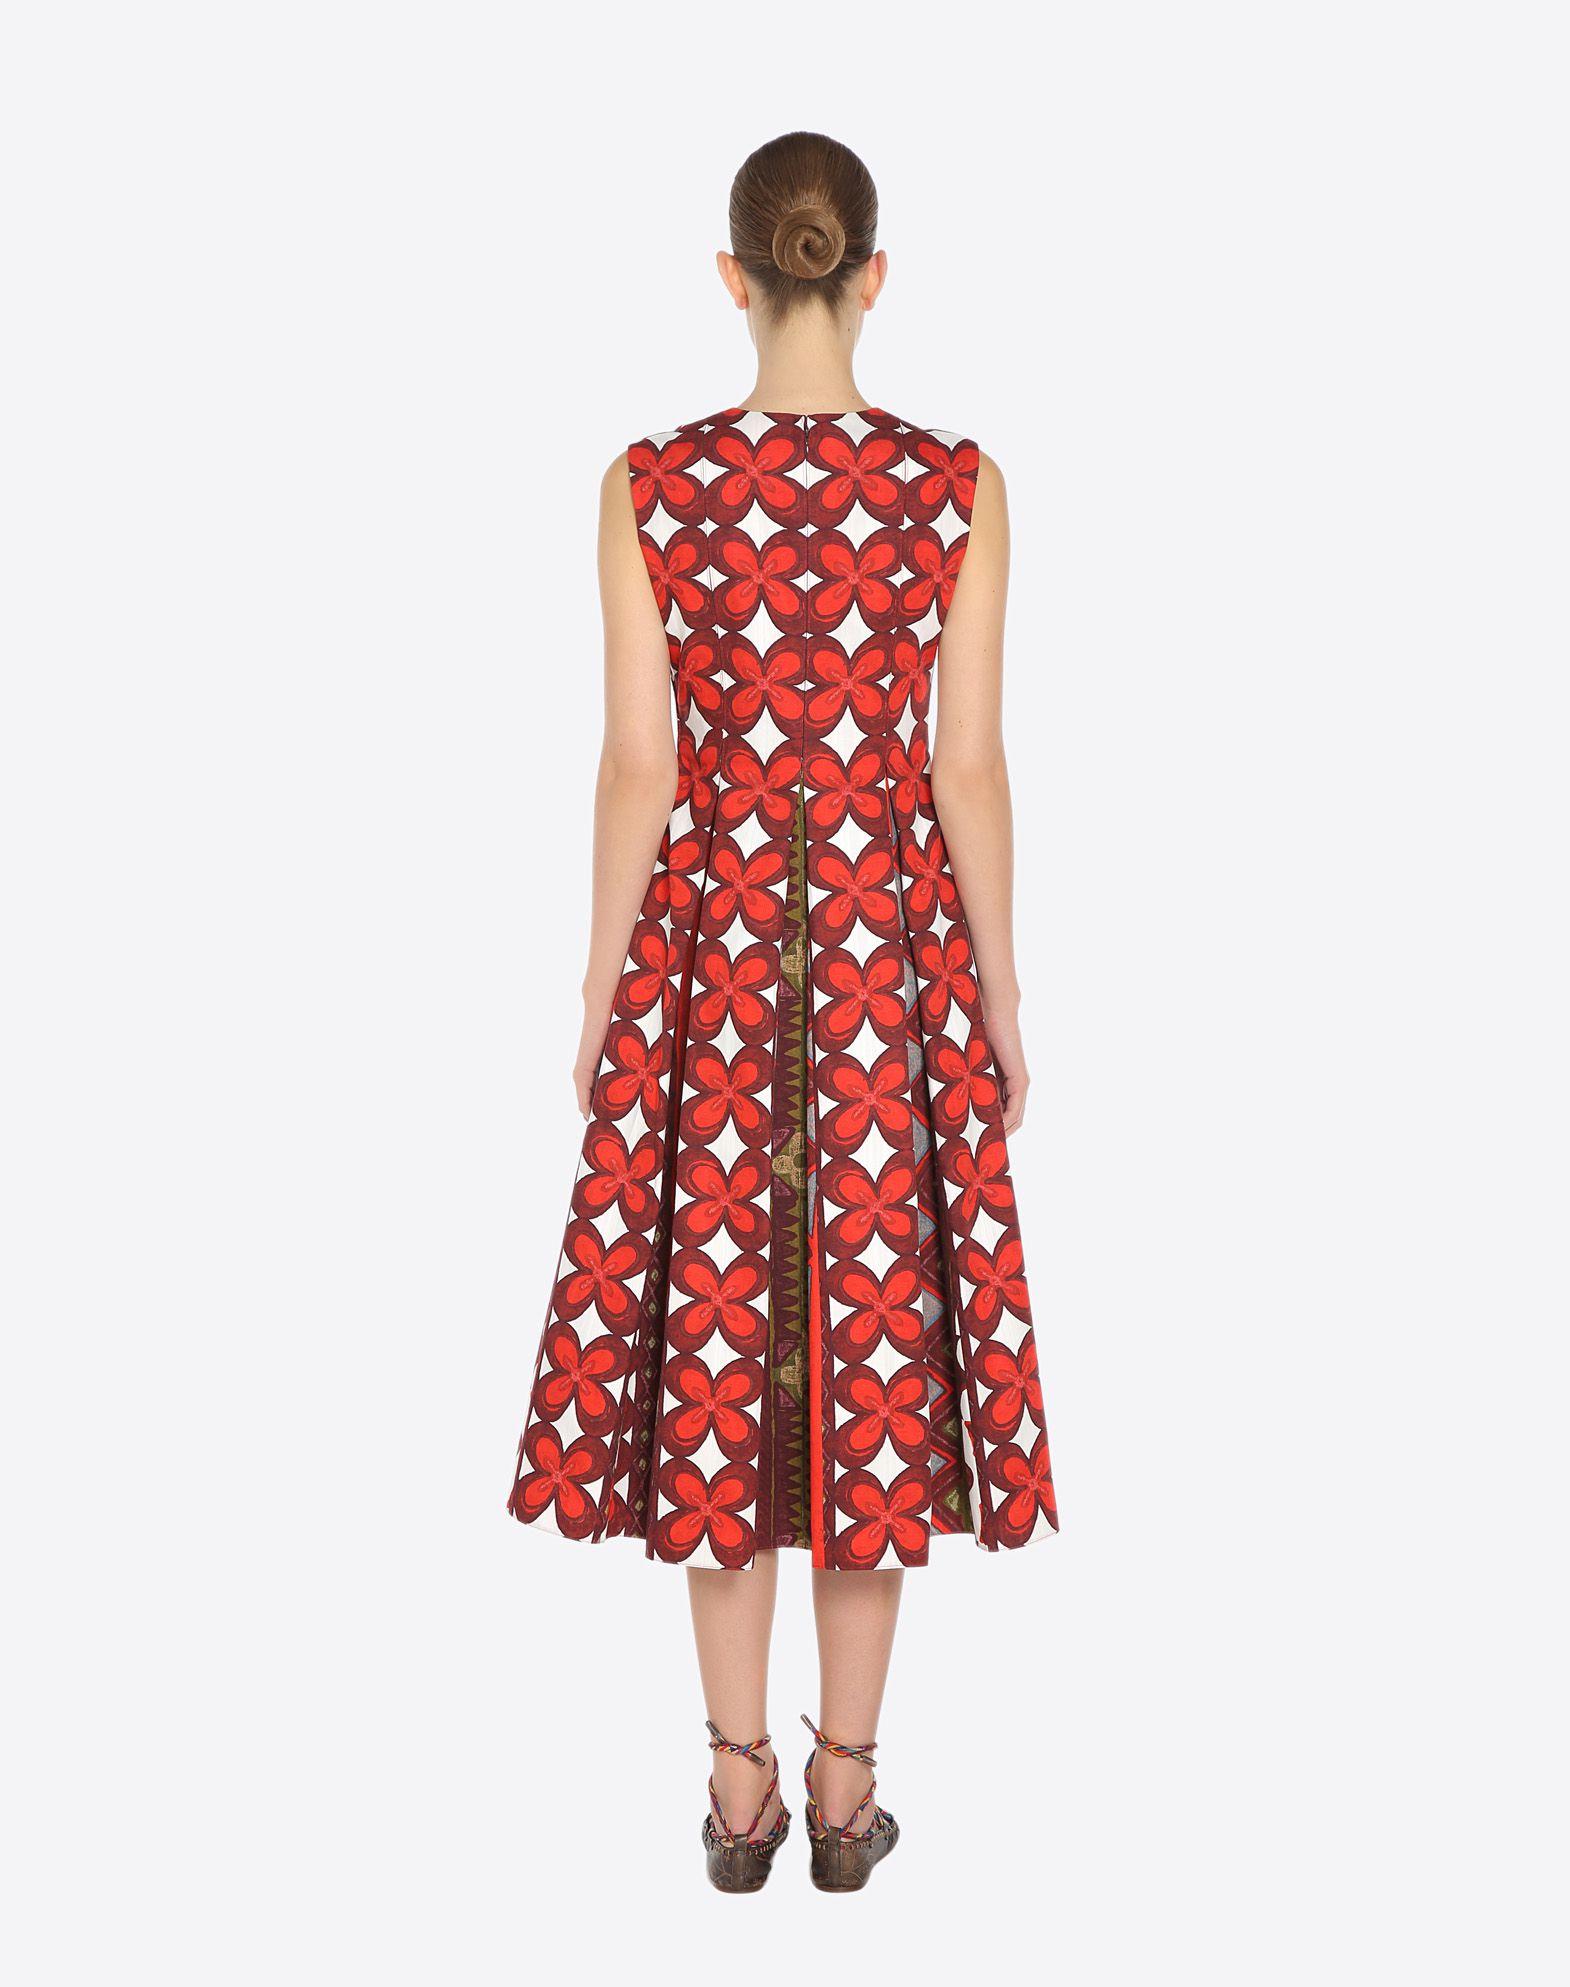 VALENTINO Pleated detailing Ethnic design Round collar Rear zip closure Semi-lined Sleeveless Plain weave  34696079qg